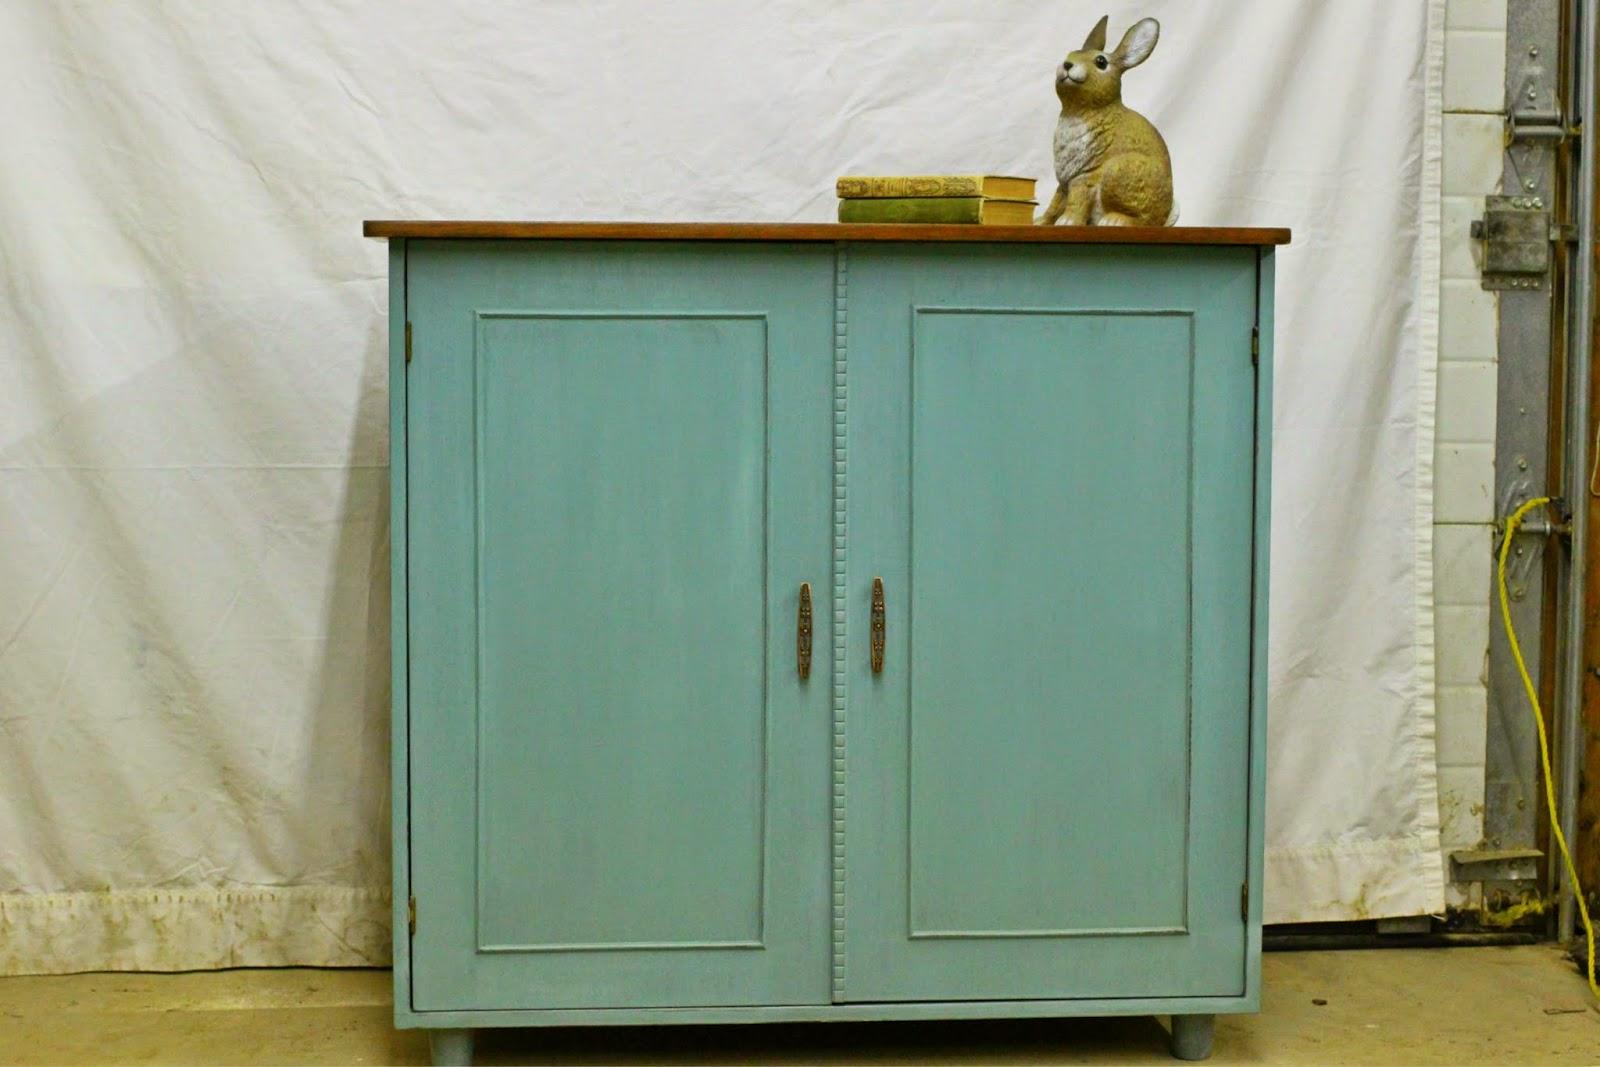 Http://www.kijiji.ca/v Hutch Display Cabinet/hamilton/turquoise Storage  Cabinet/582131398